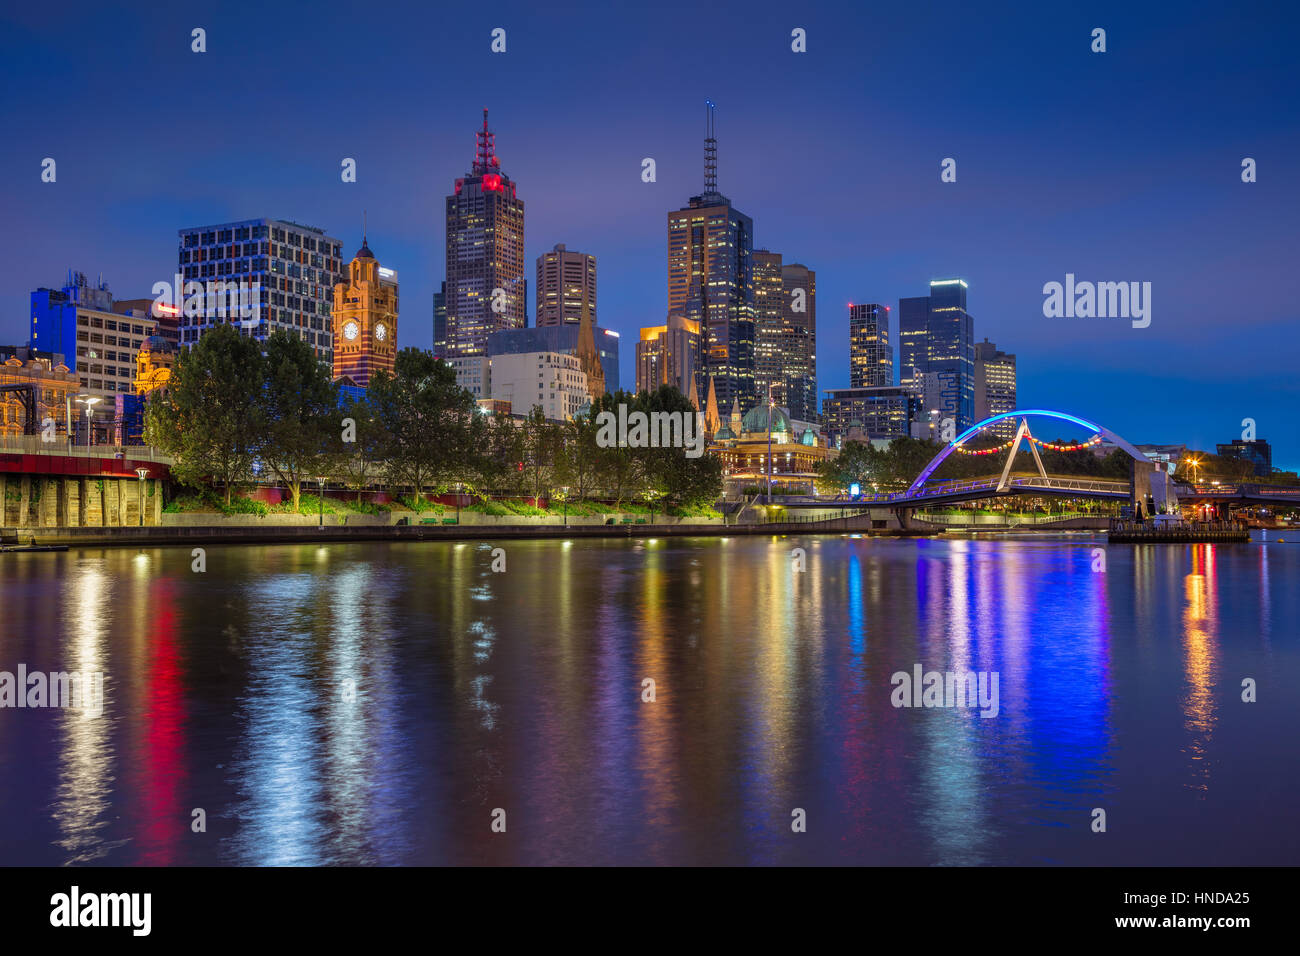 City of Melbourne. Cityscape image of Melbourne, Australia during twilight blue hour. - Stock Image